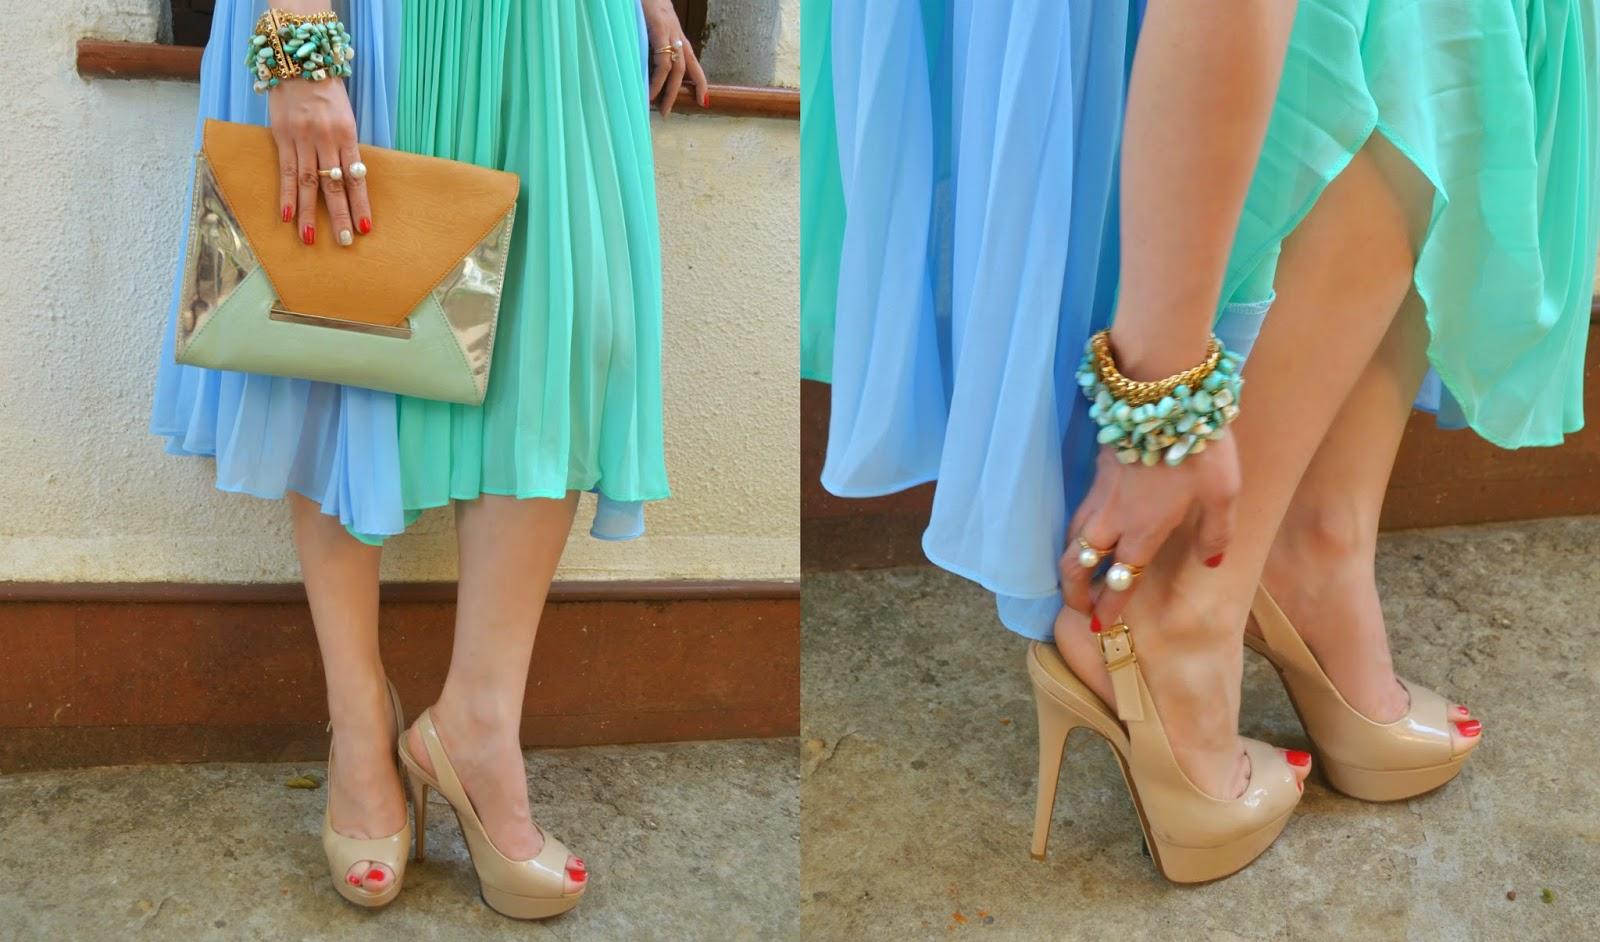 Nude Heels, Aldo Envelope clutch, Turquoise Bracelt, Pearl Rings